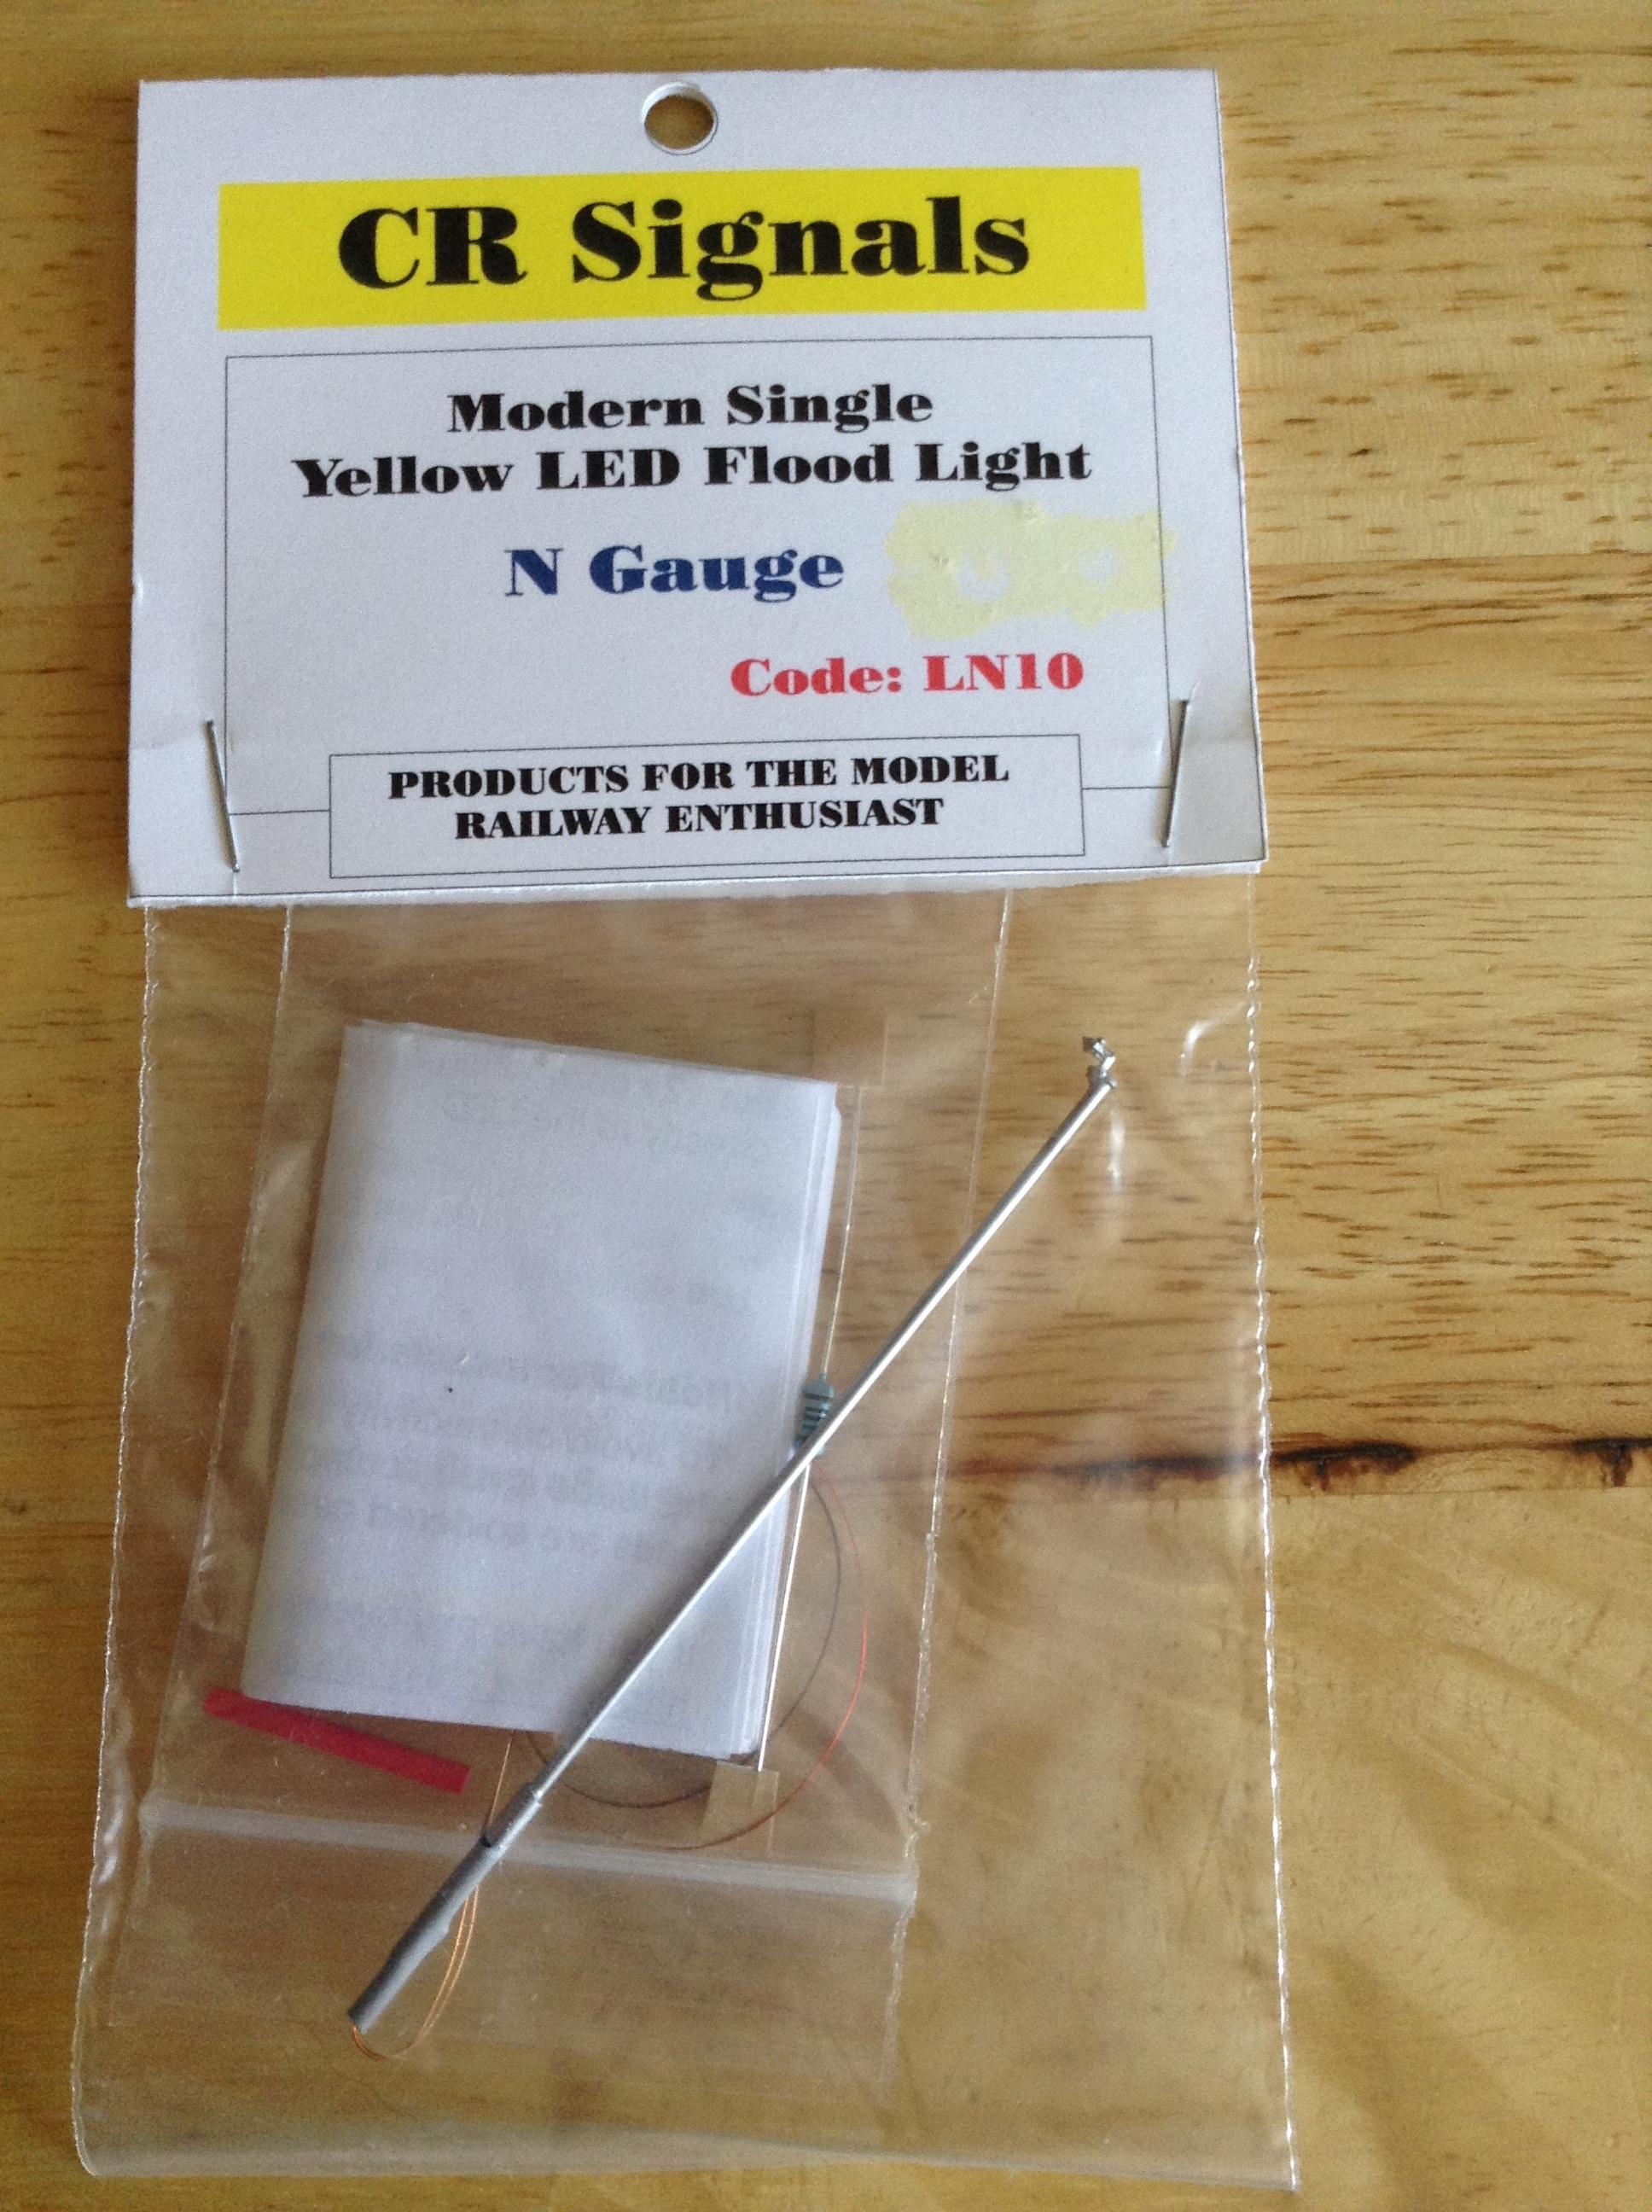 CRLN10 Modern Single Yellow LED Flood Light